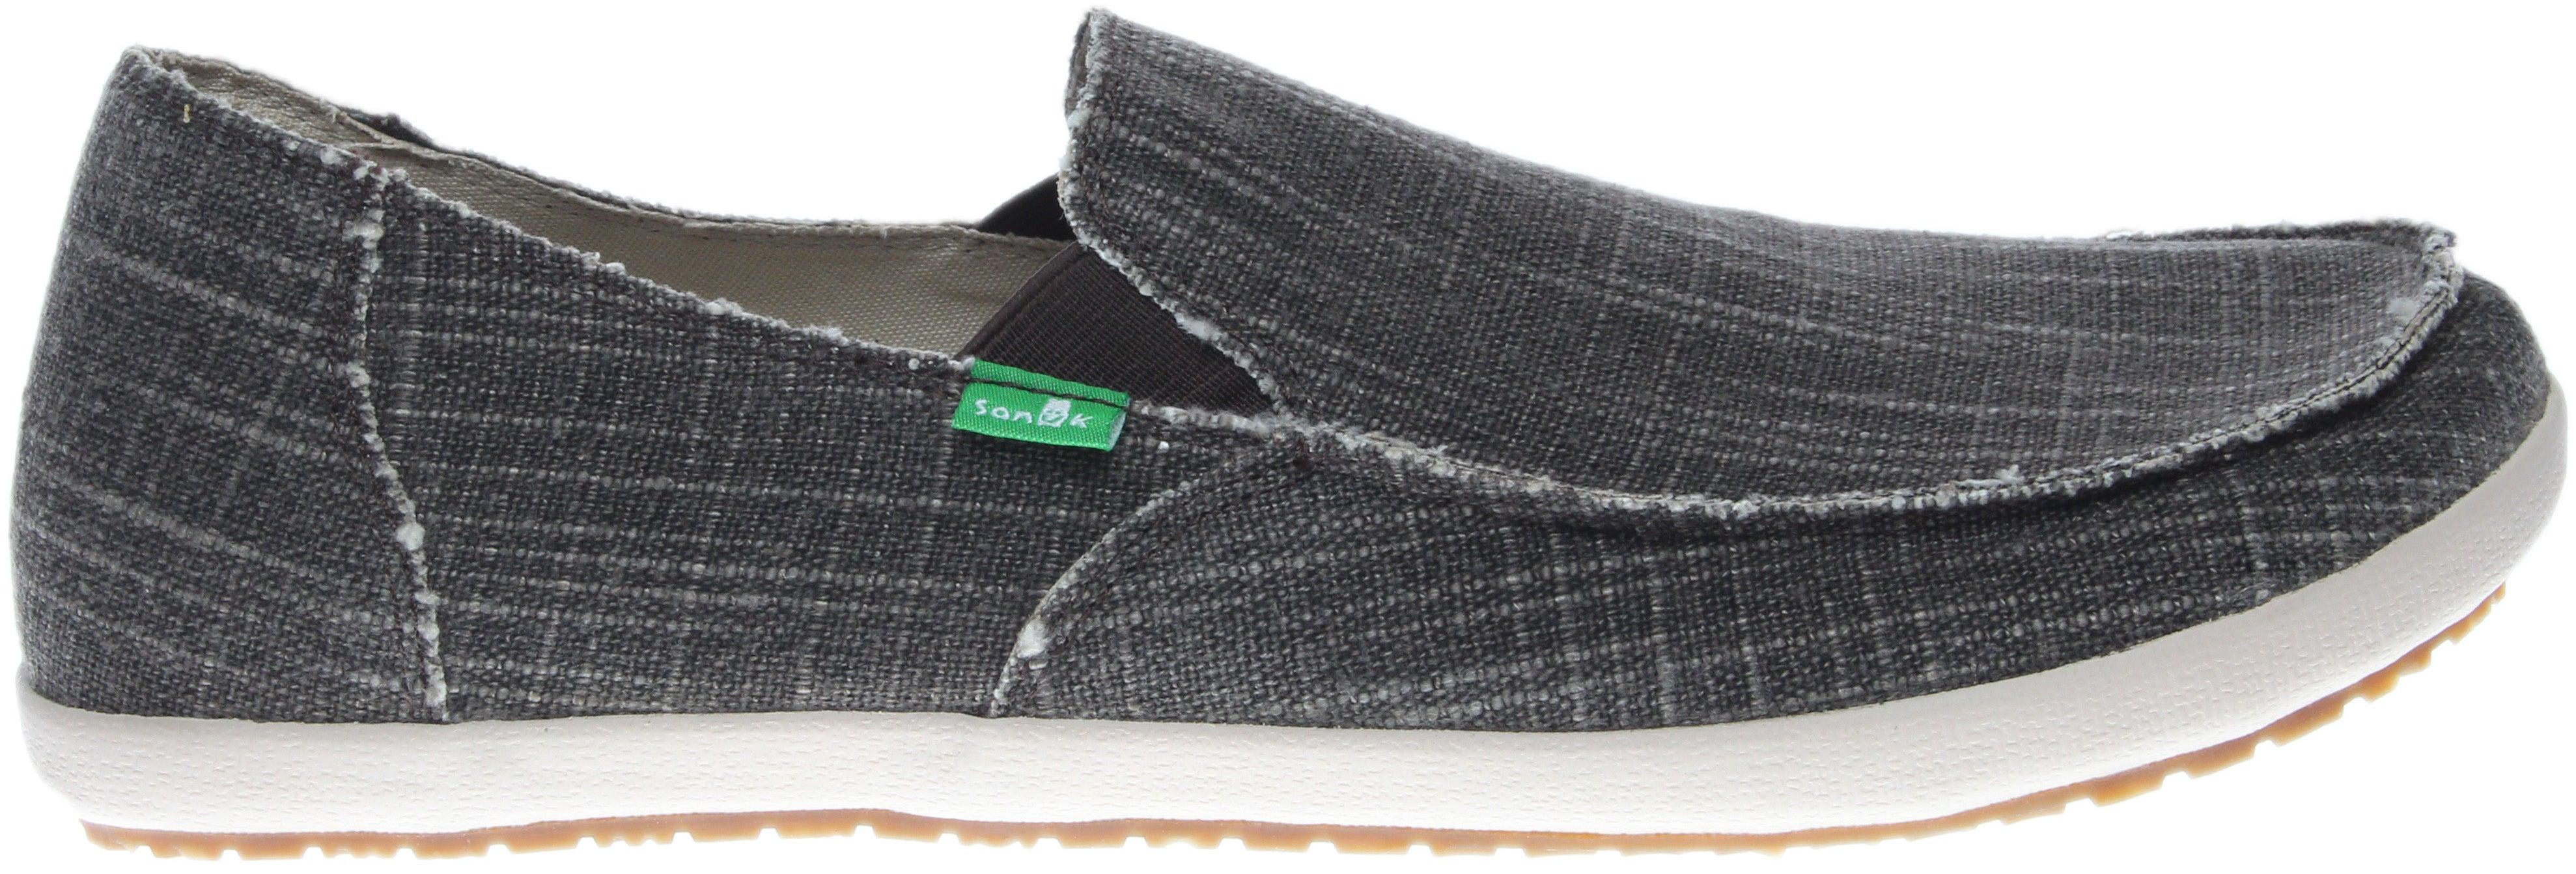 Zapatos casuales para hombre Rounder Hobo Slub Slip On 10 Brown 1015975 BhwrZ